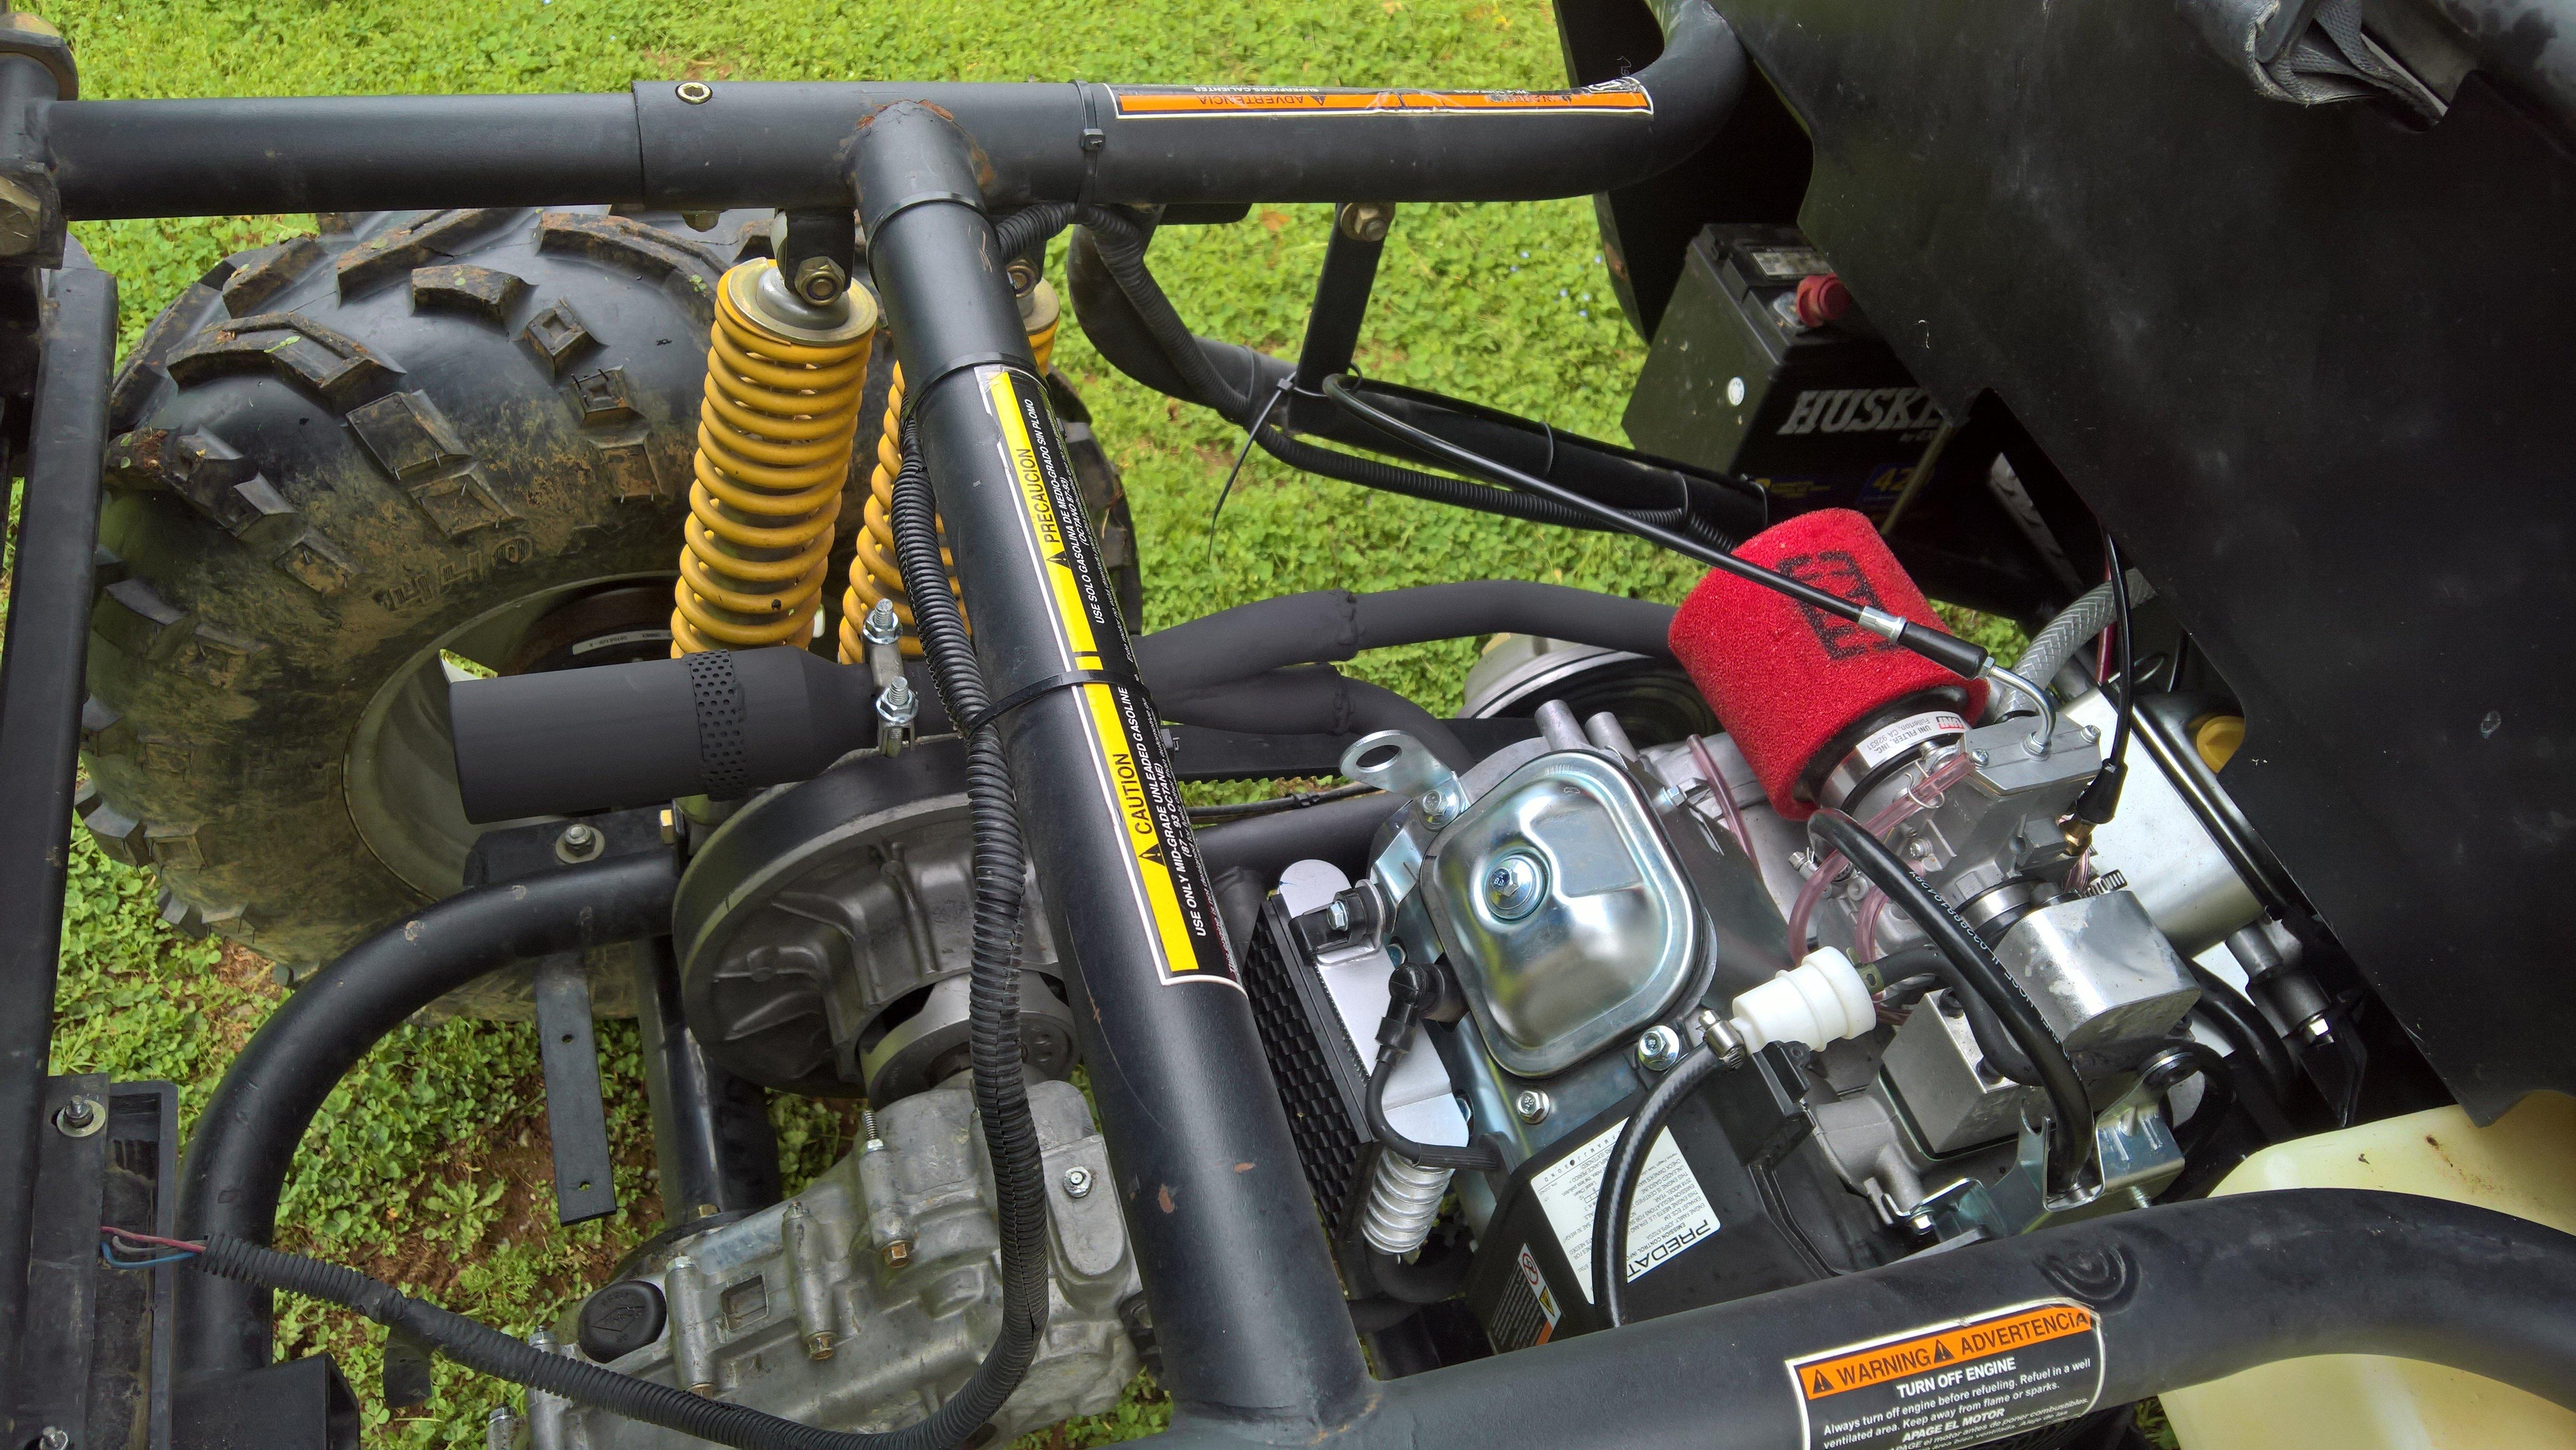 American Sportworks 650 2wd engine swap, to Predator 670